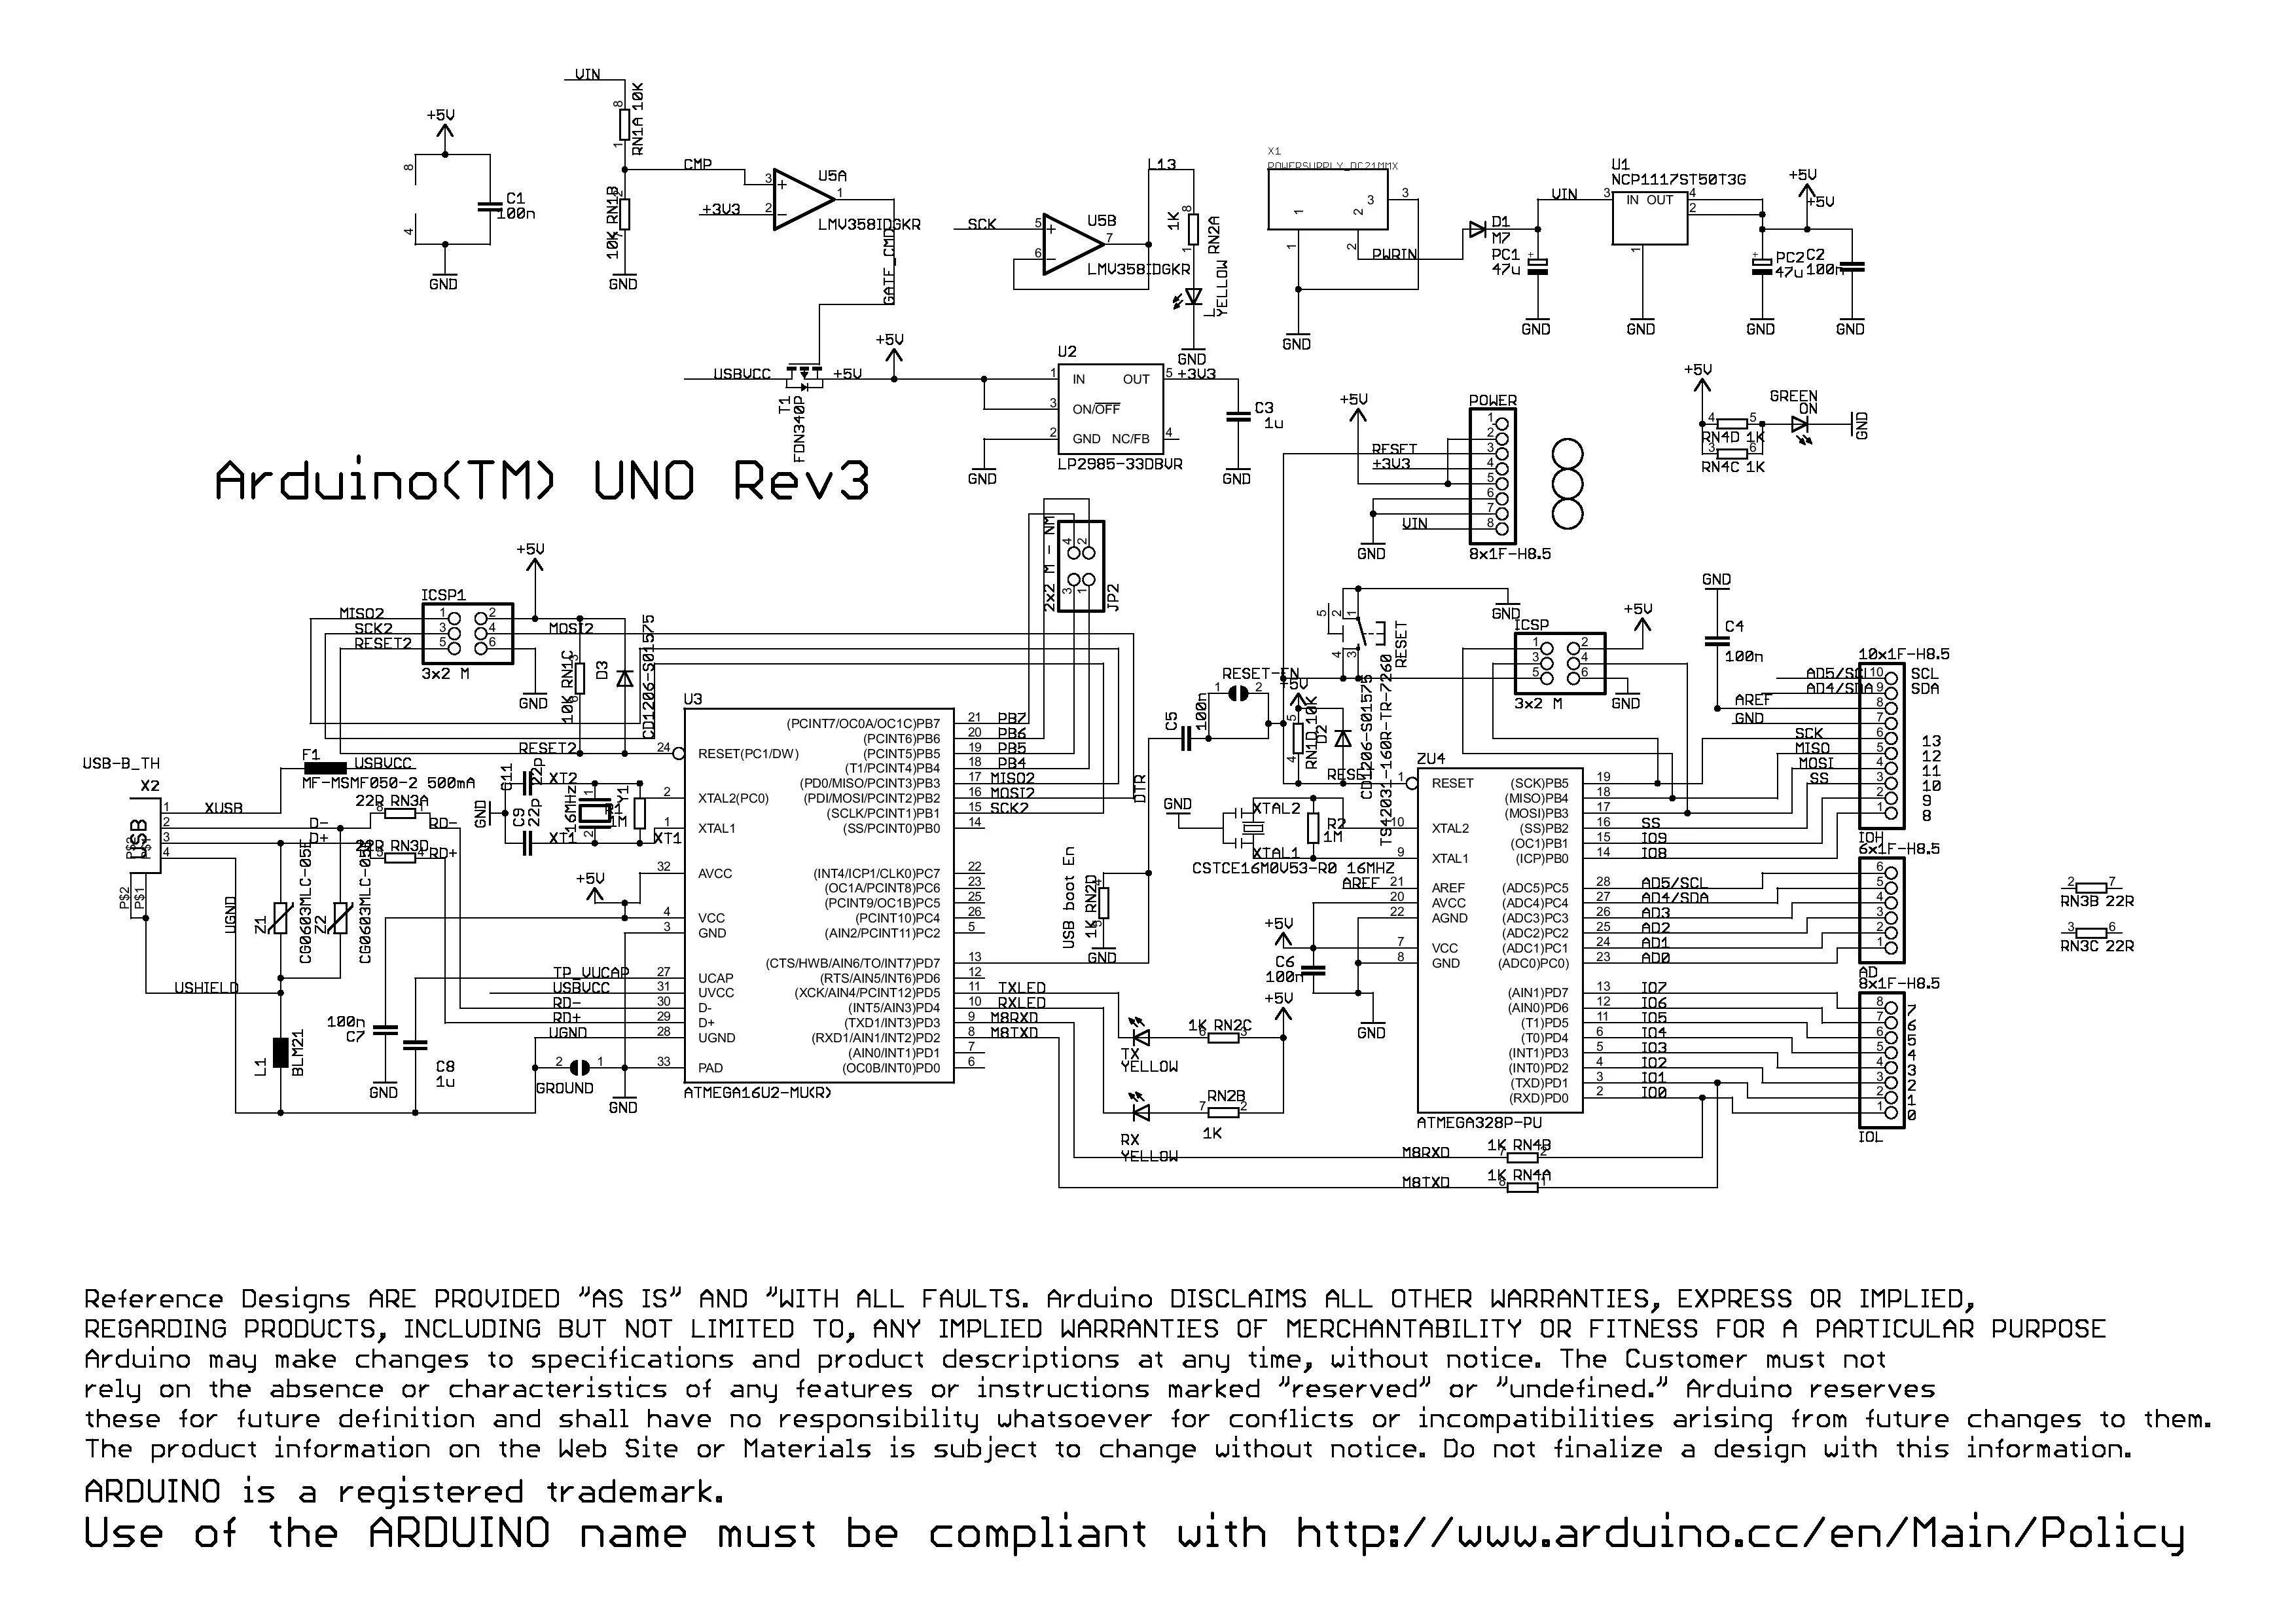 t1 wiring diagram pdf kia pride electrical wiring diagram pdf wiring library  kia pride electrical wiring diagram pdf